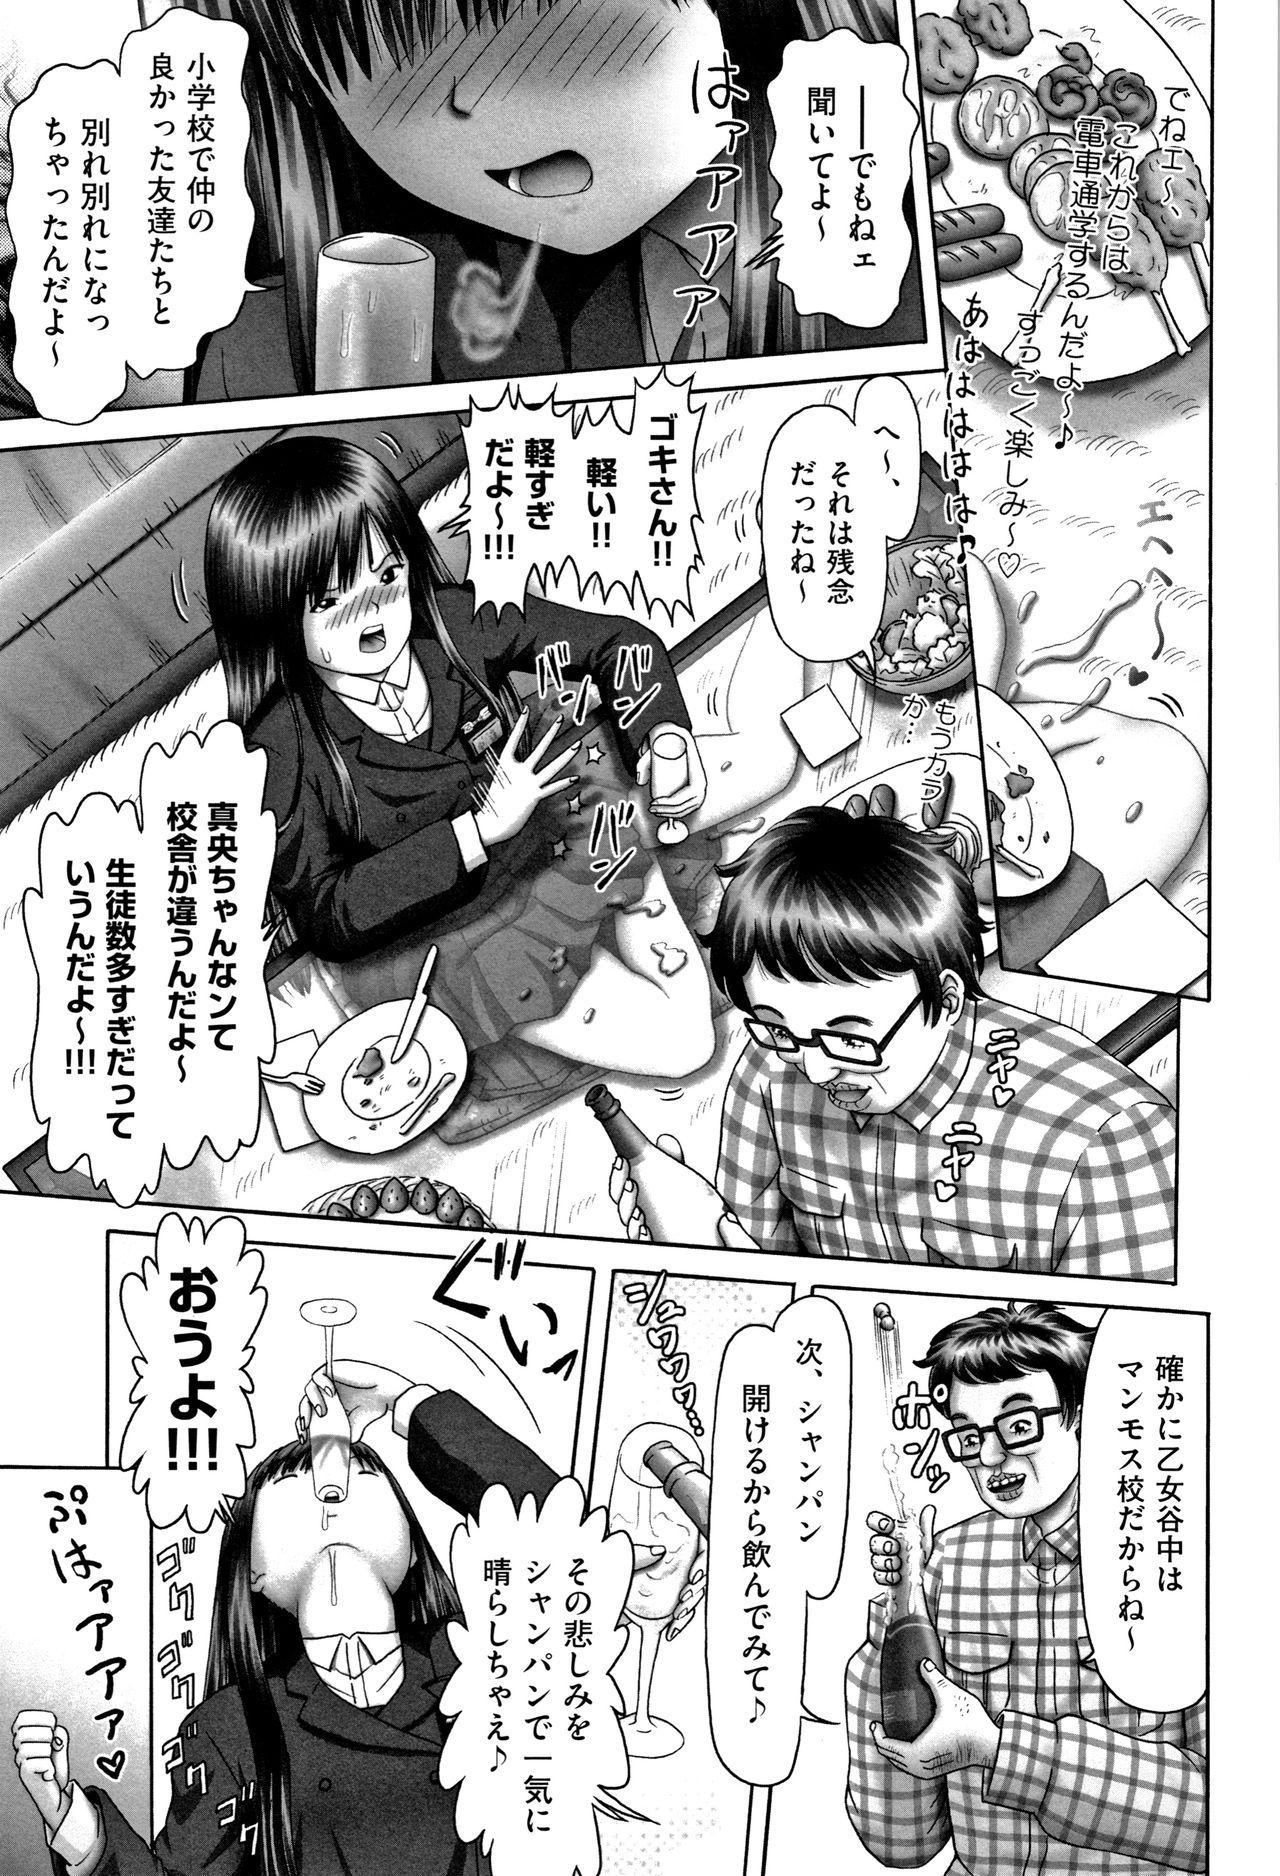 Shoujo Kumikyoku 11 35